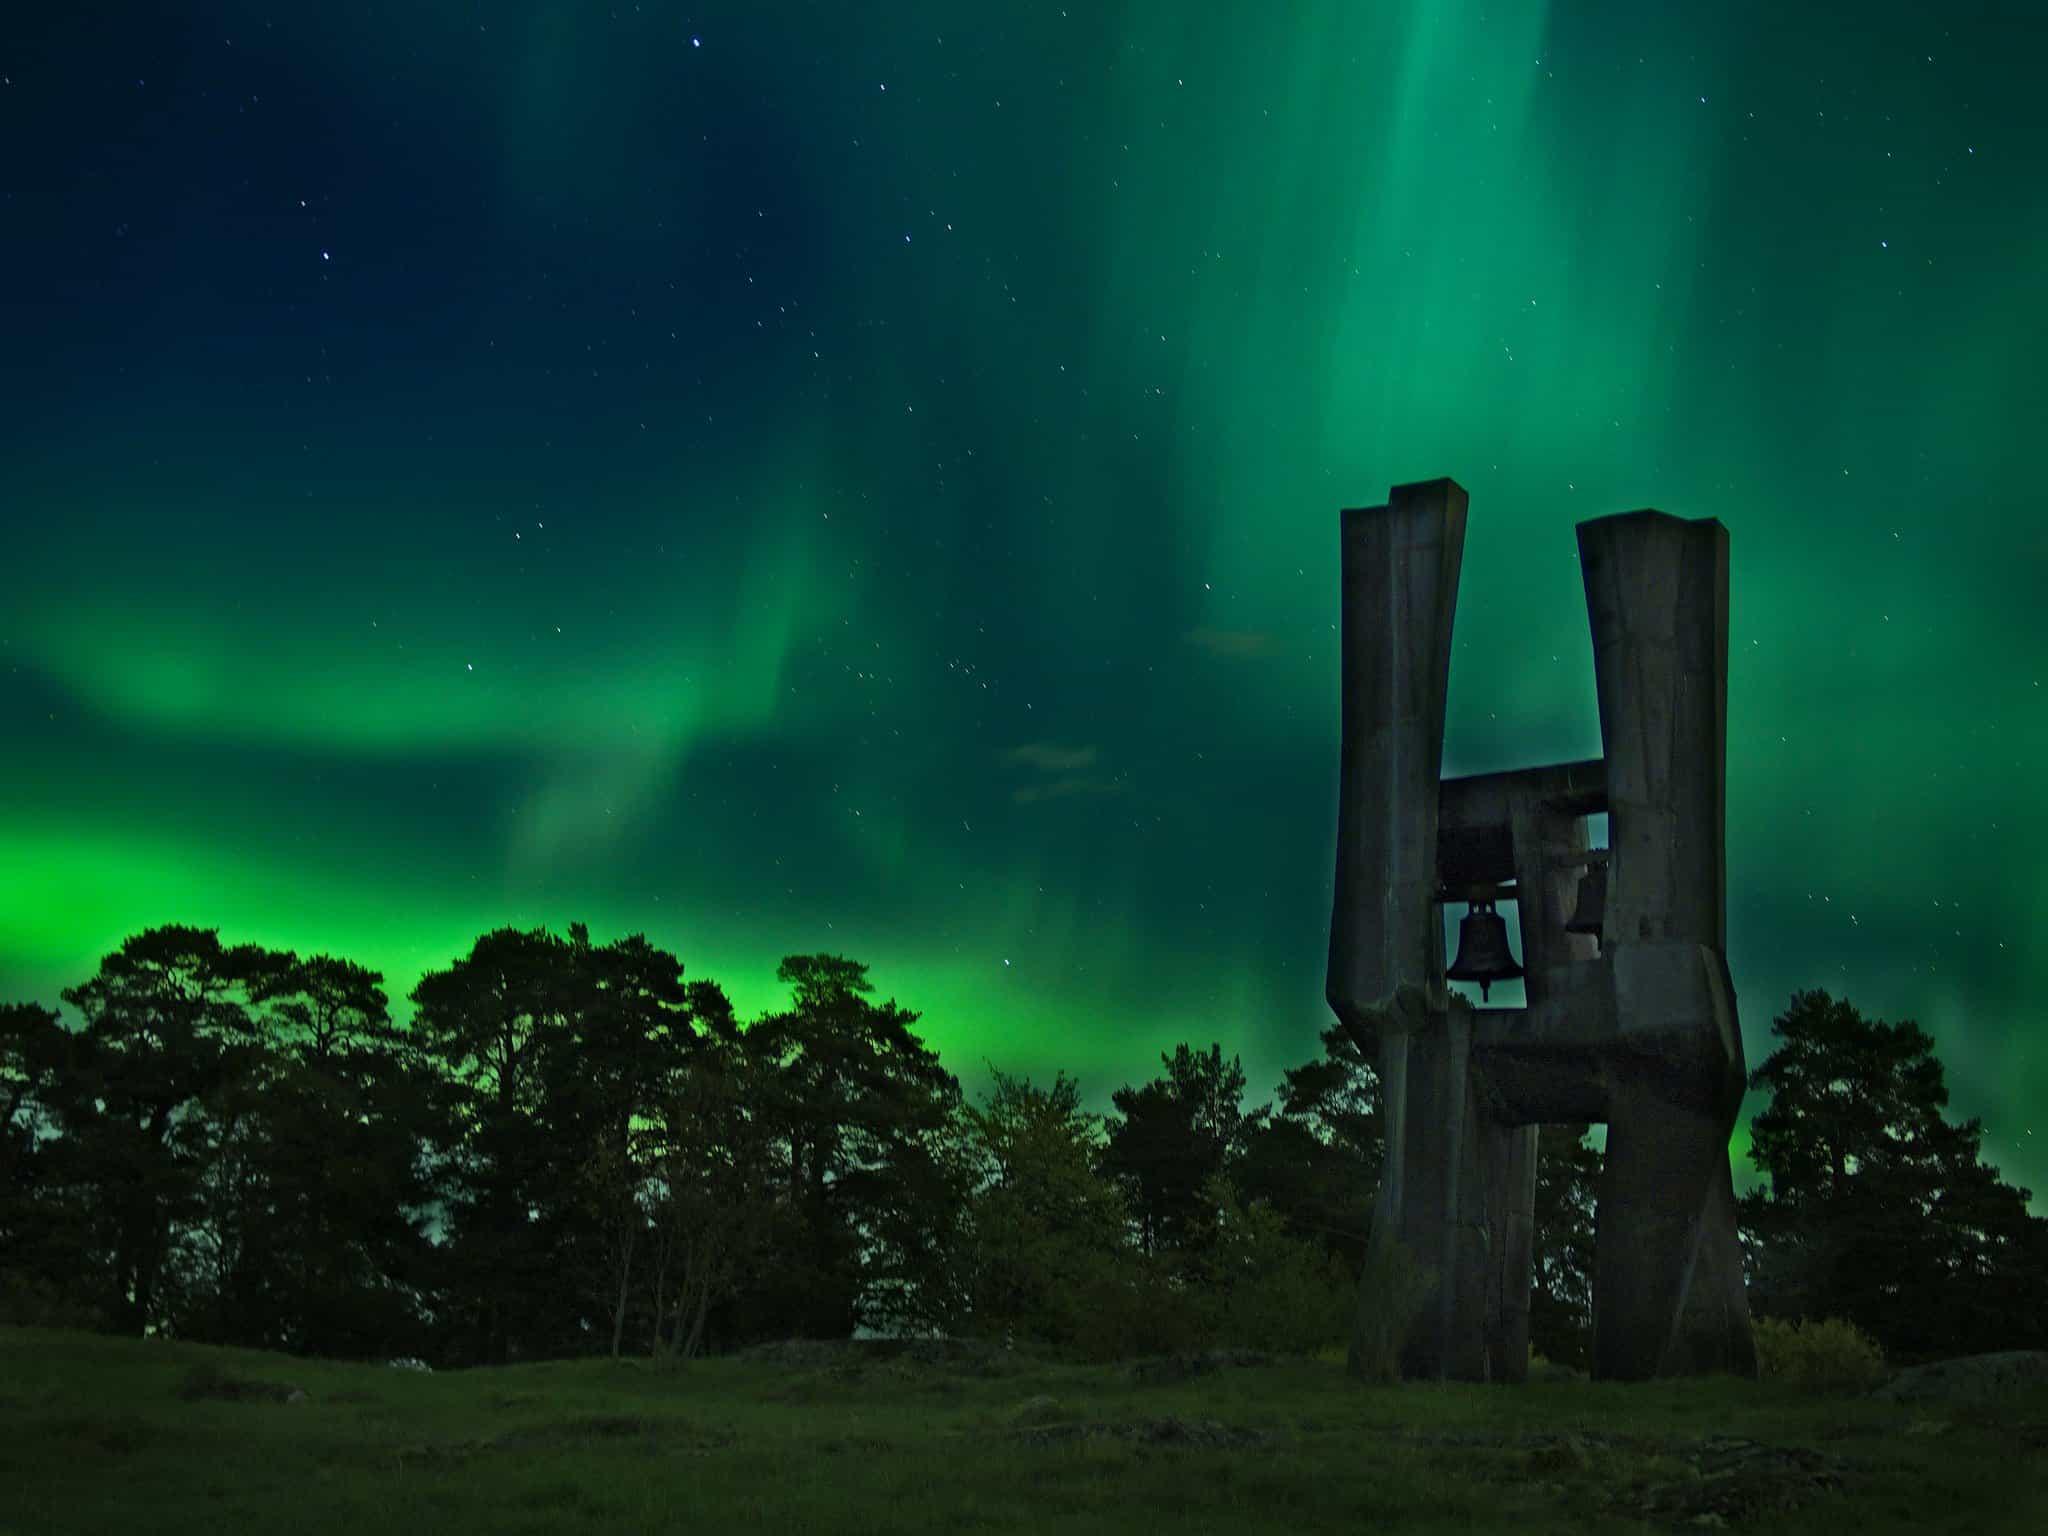 Norhern Lights in Sweden - Thomas Fabian via Flickr